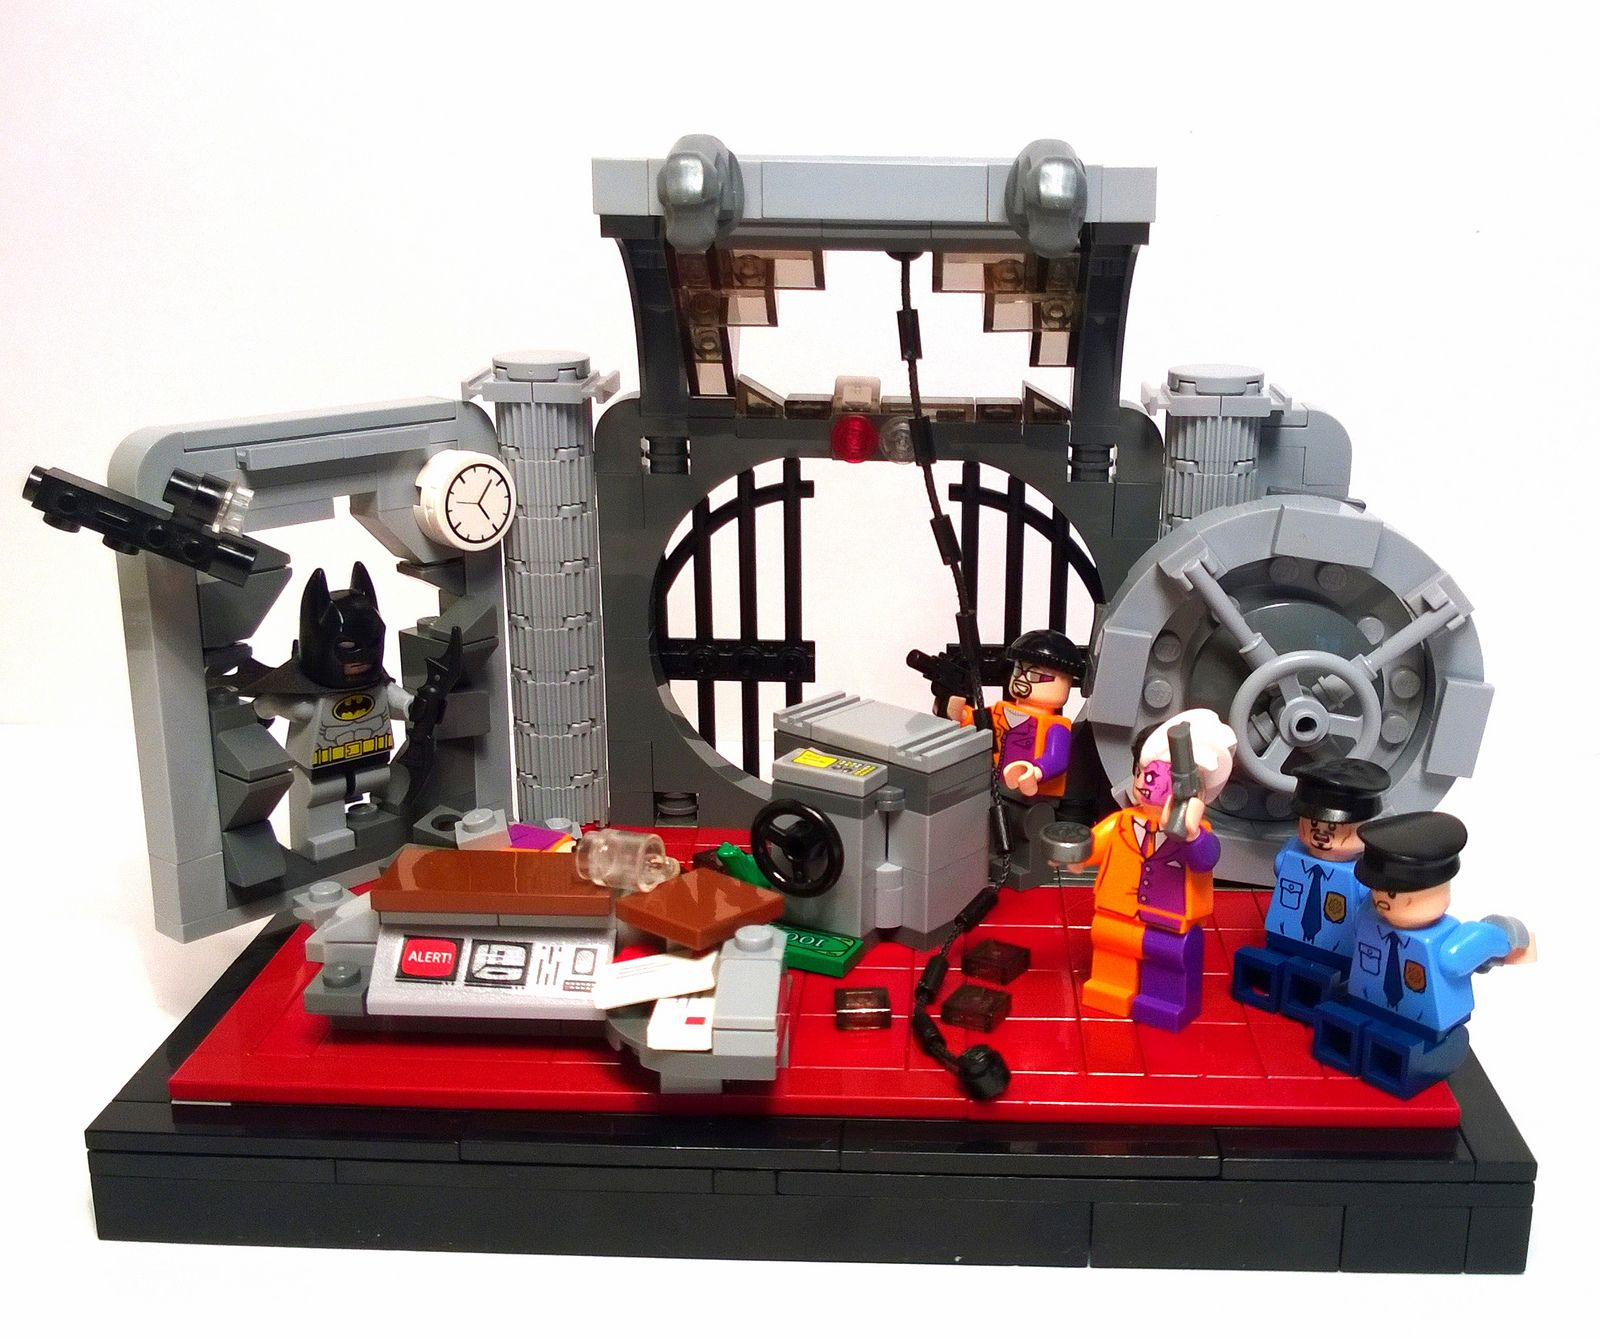 Batman Arkham Knight Batcave: Lego Batman Movie, Lego, Lego